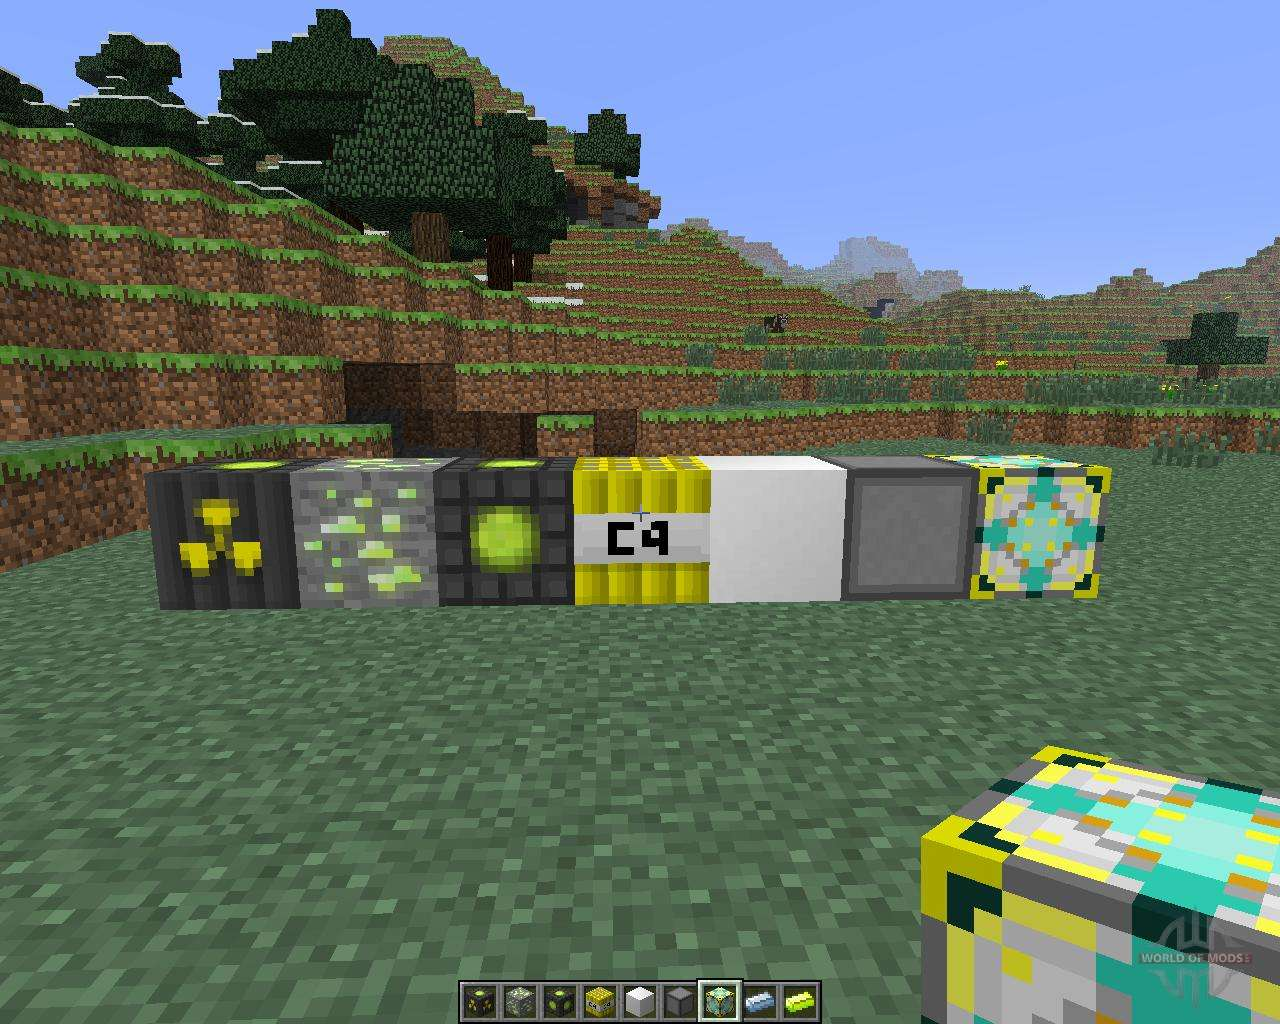 Мод на бомбы Hbm's Nuclear Tech для Майнкрафт 1.7.10/1.8.9